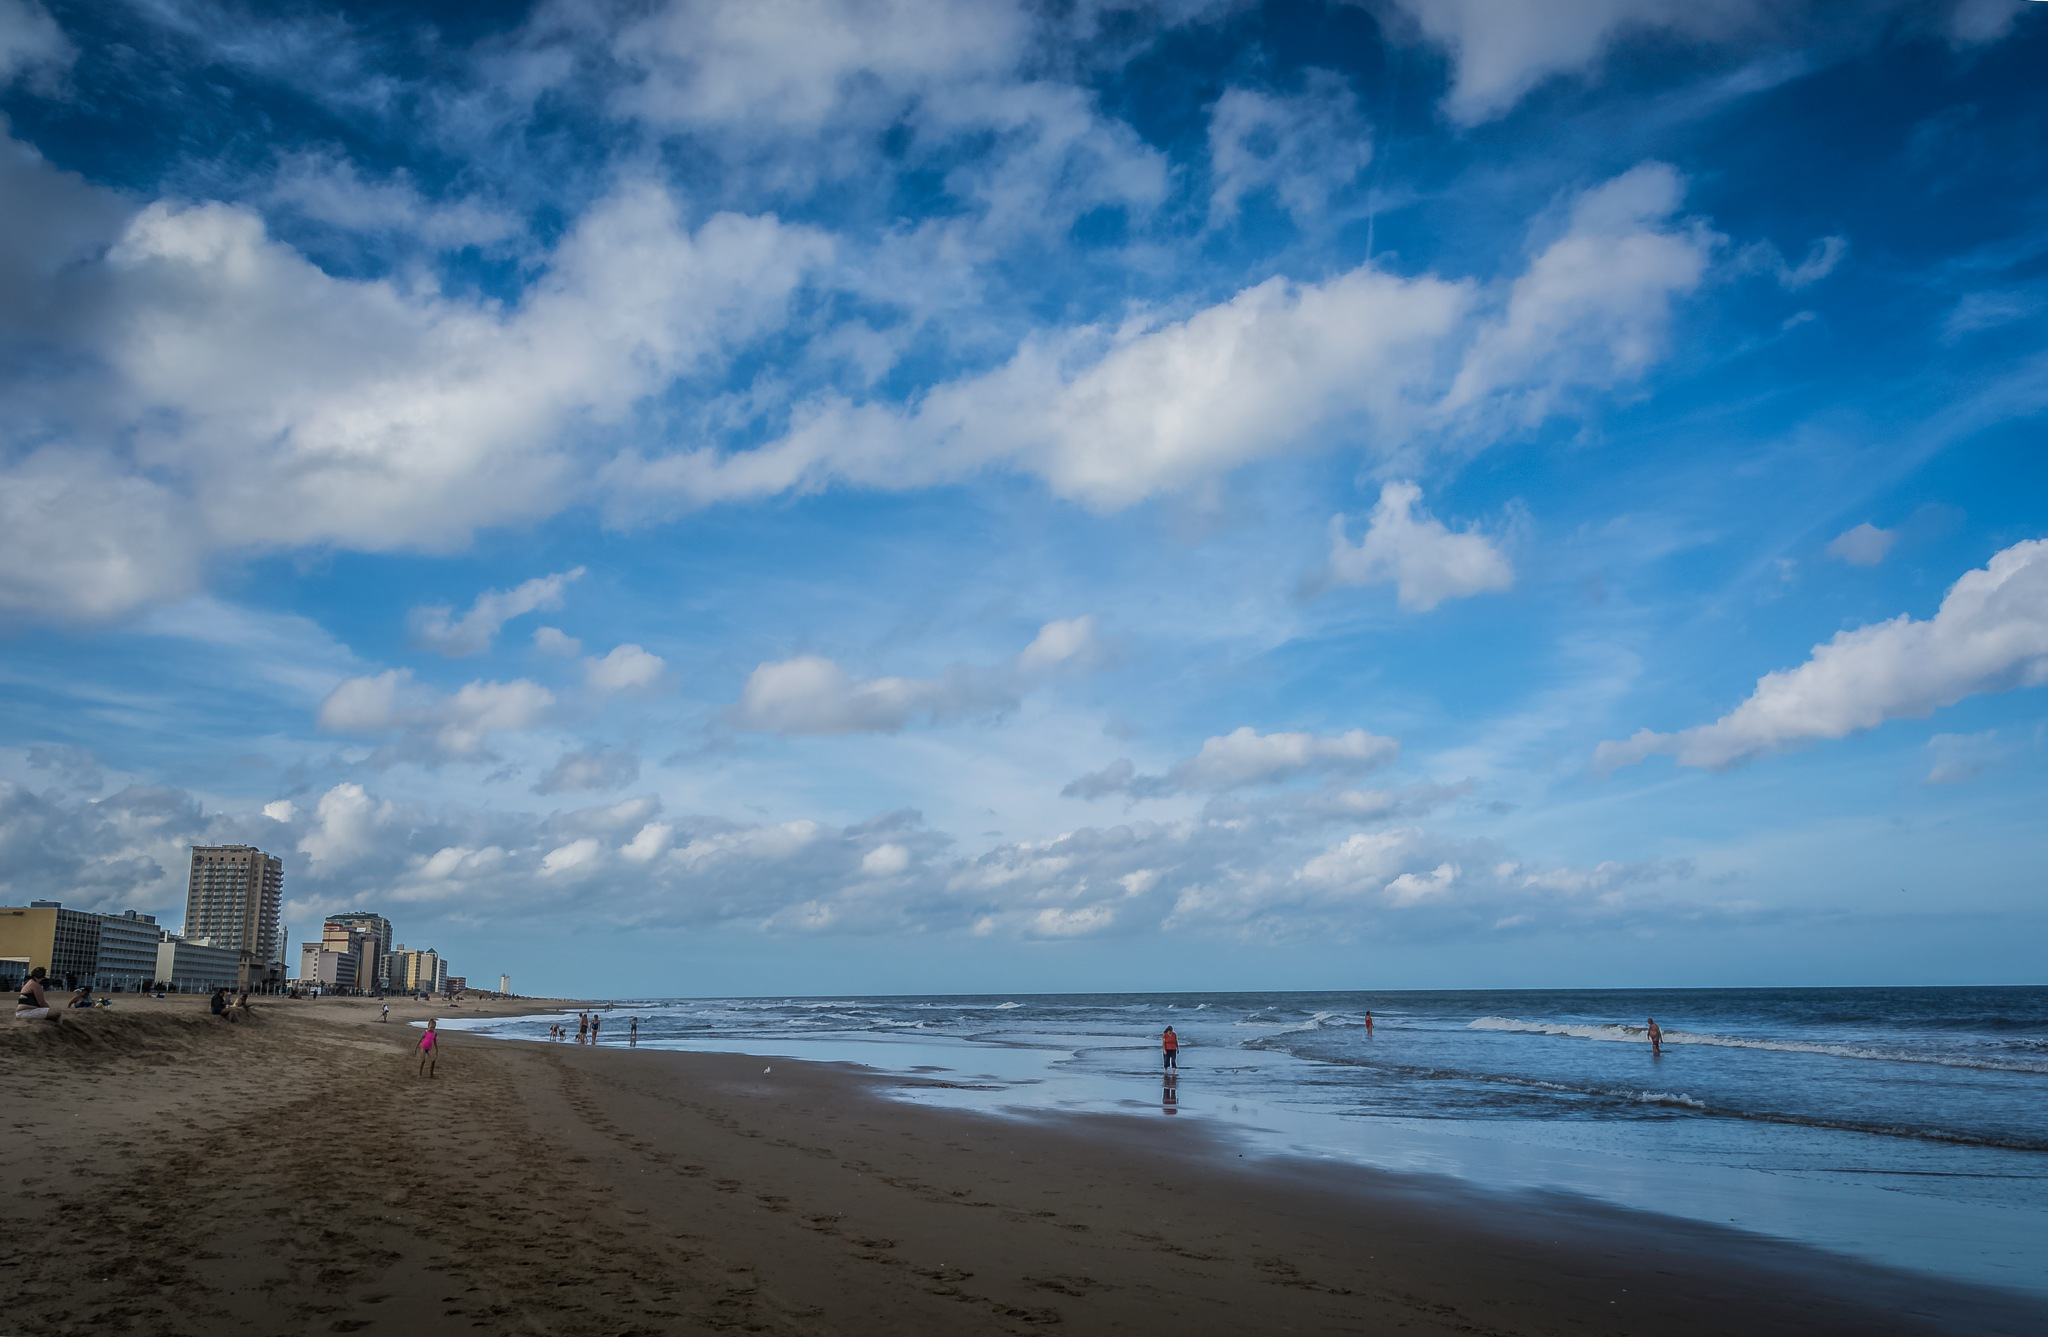 Virginia Beach Summer End 2 by kelrey31